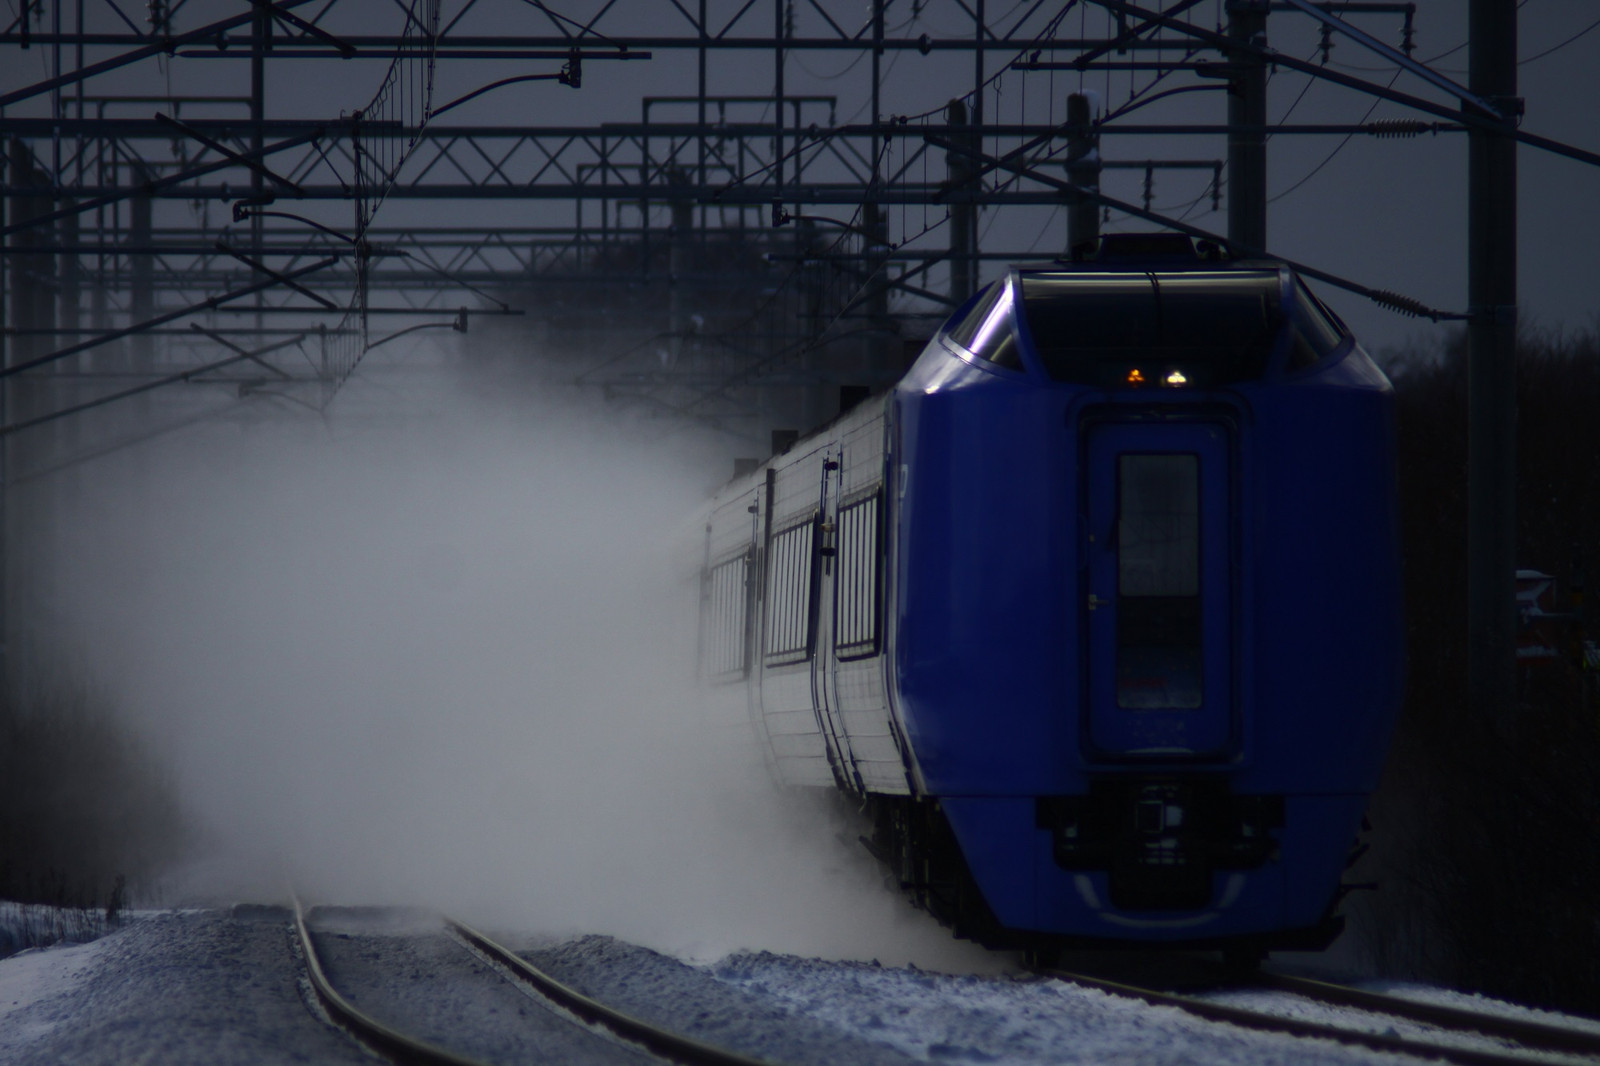 Jr1512191001